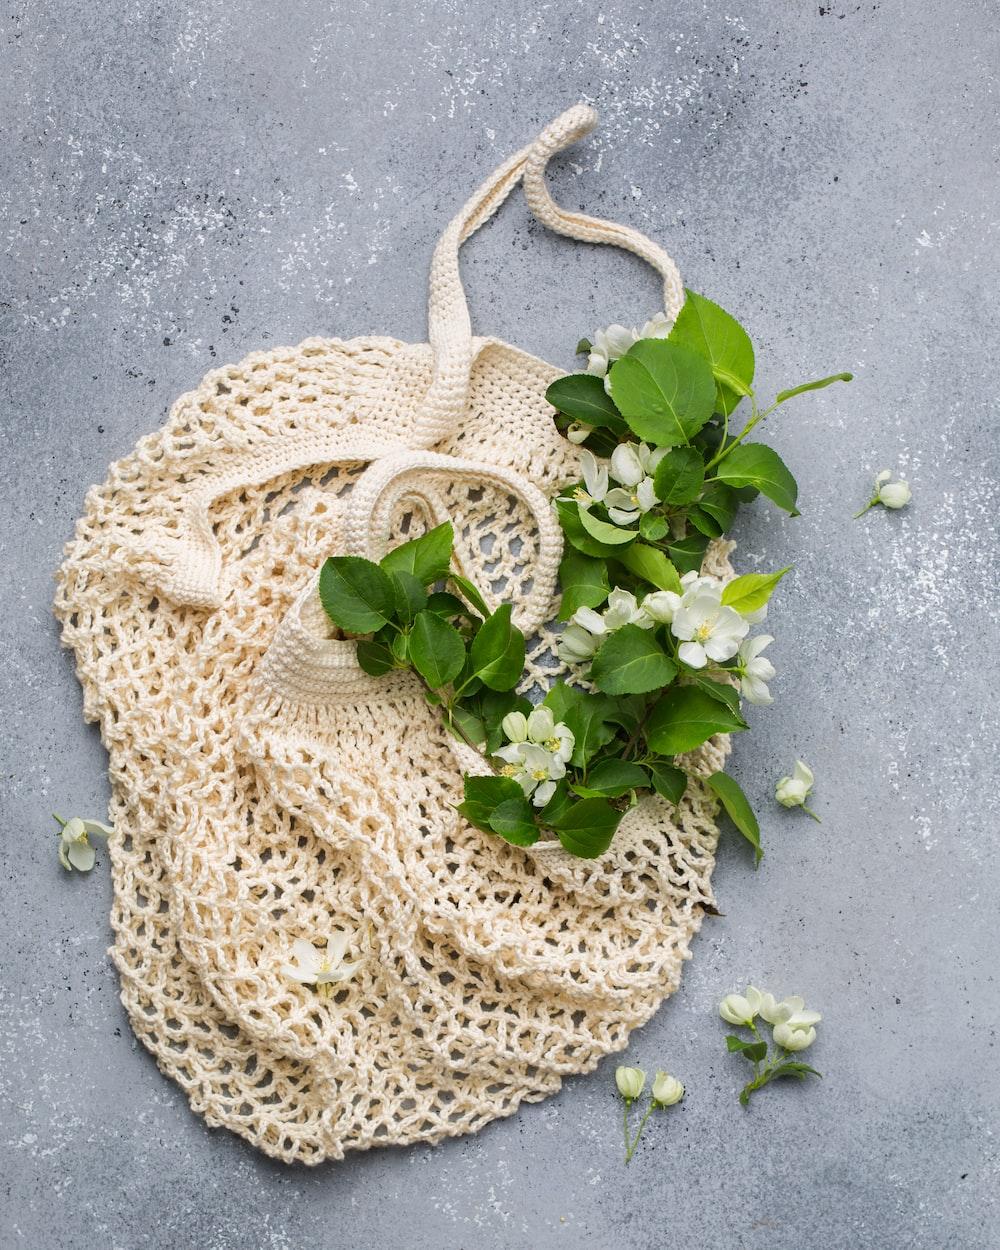 beige net bag with flowers